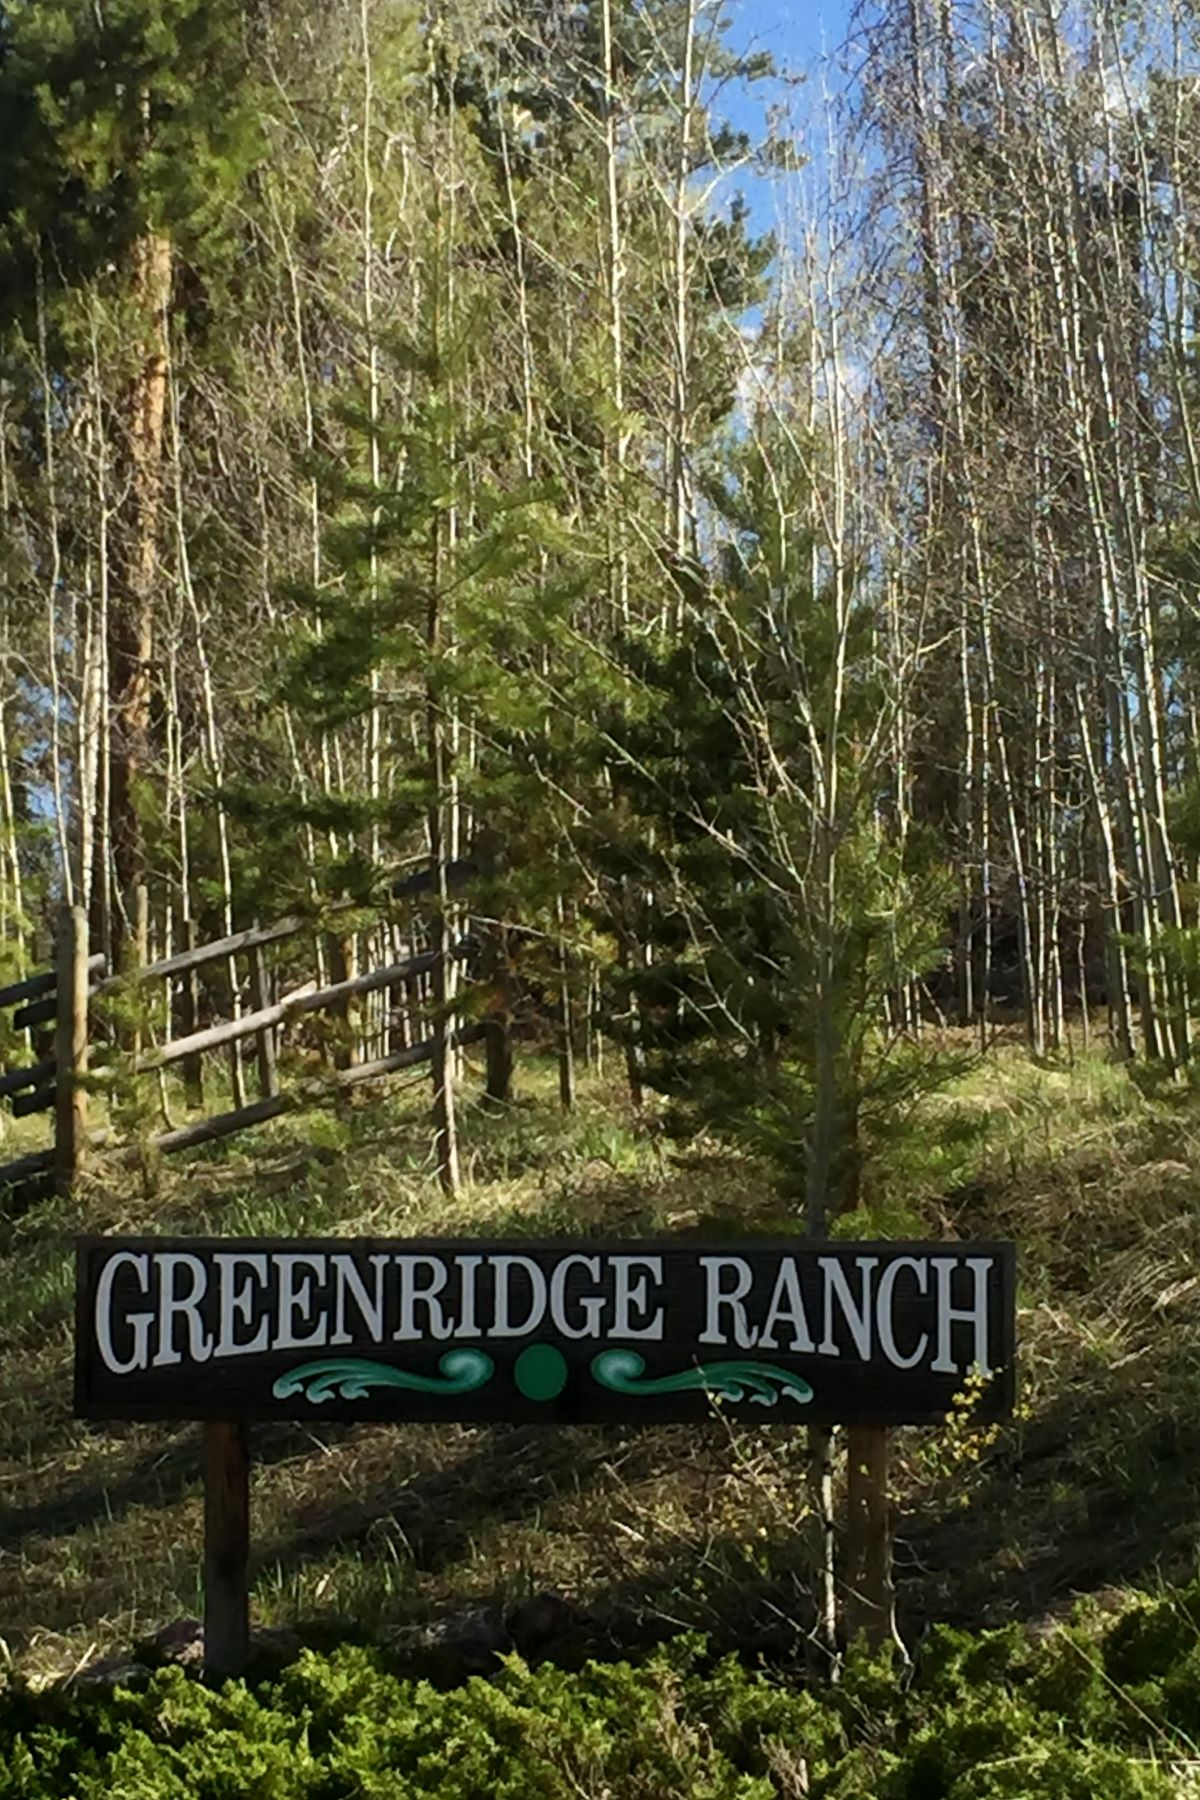 أراضي للـ Sale في Lot 2 Greenridge Ranch 21350 Cheyenne Trail Oak Creek, Colorado, 80467 United States